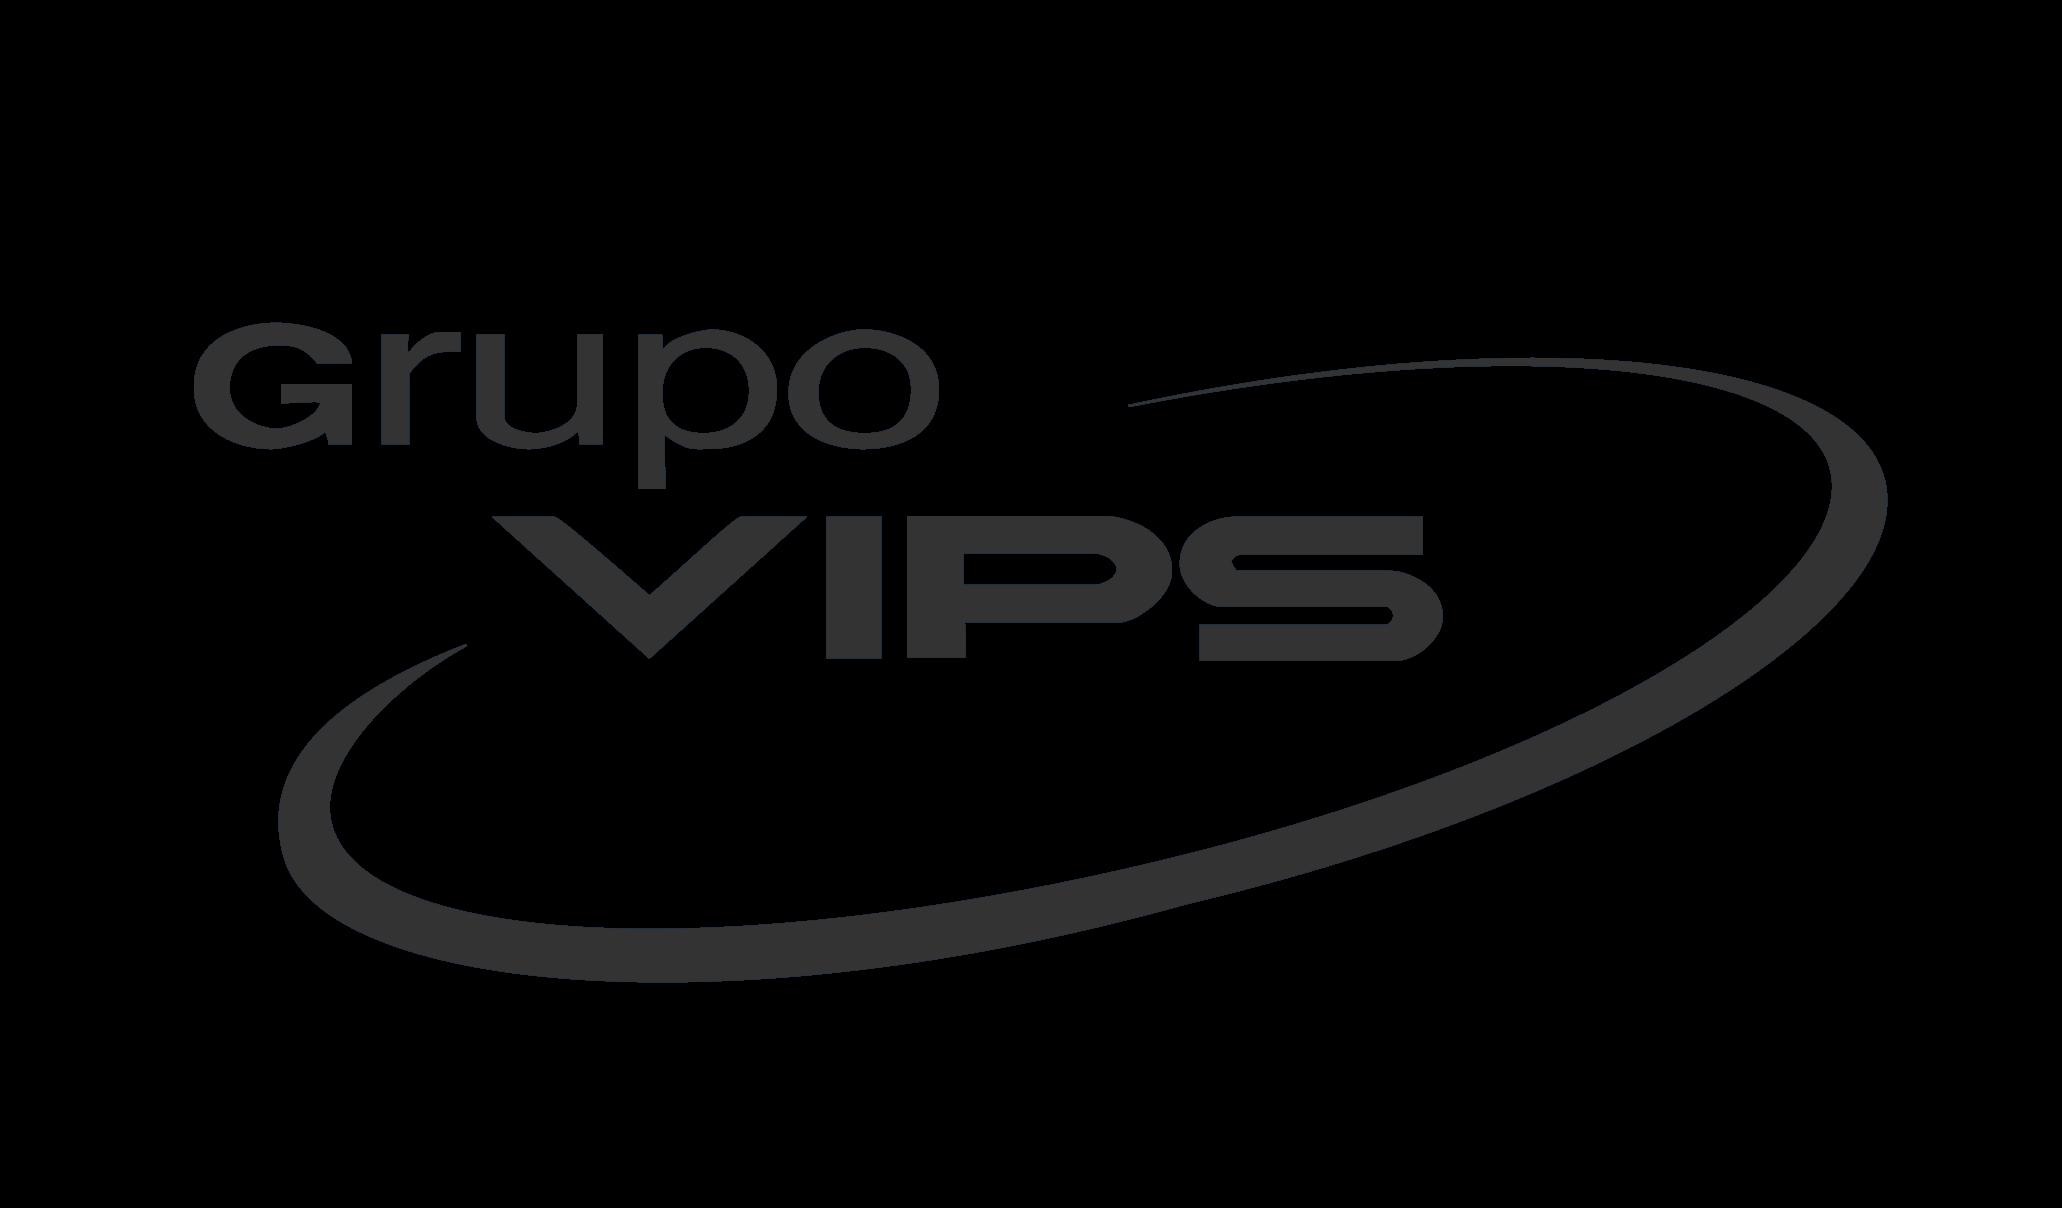 Logo01GrupoVips